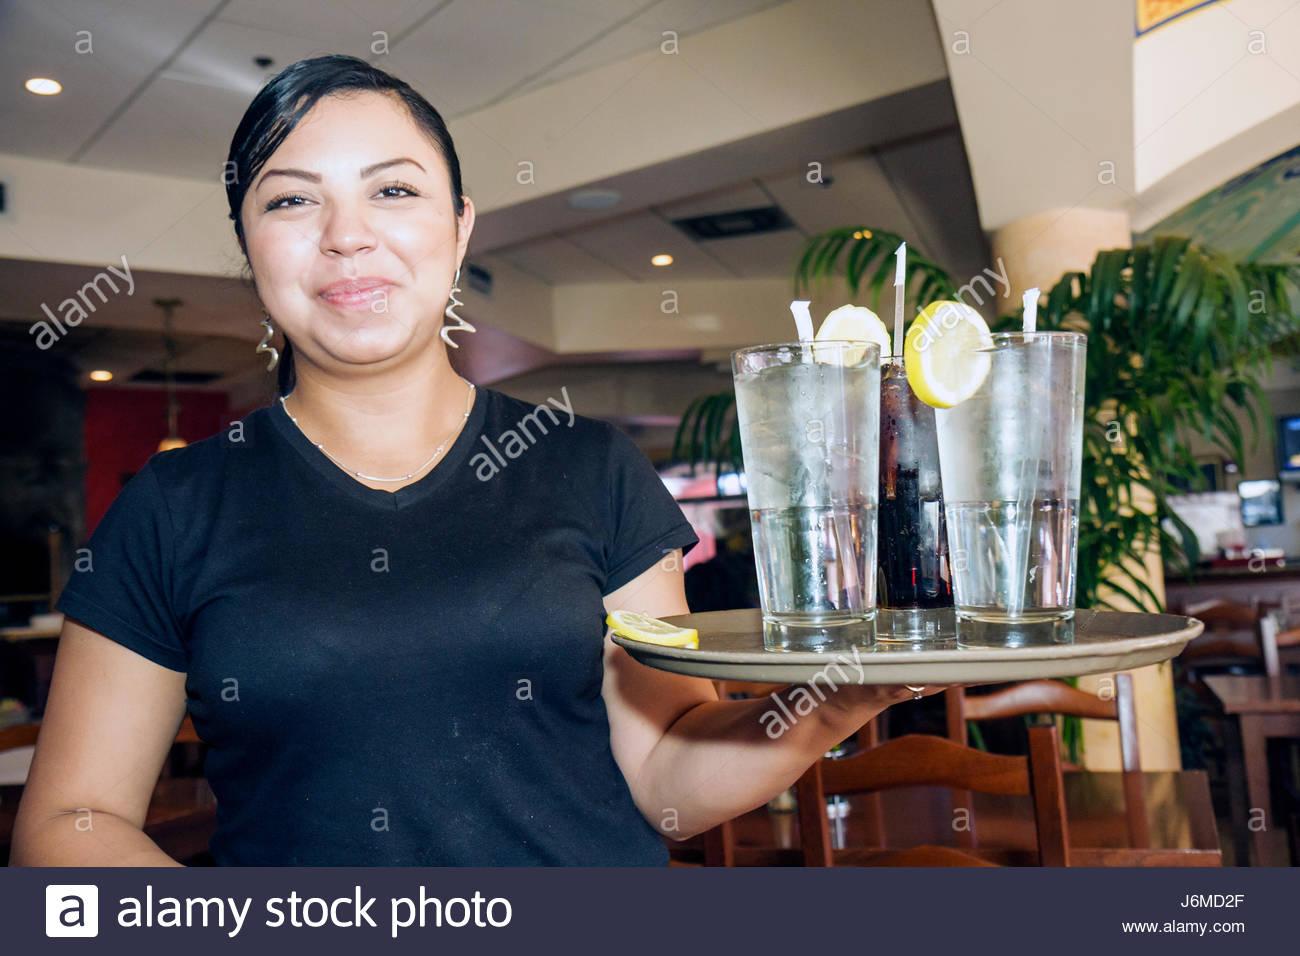 Miami Florida Miami Lakes Main Street Italy Today Restaurant Hispanic female woman waitress service water - Stock Image